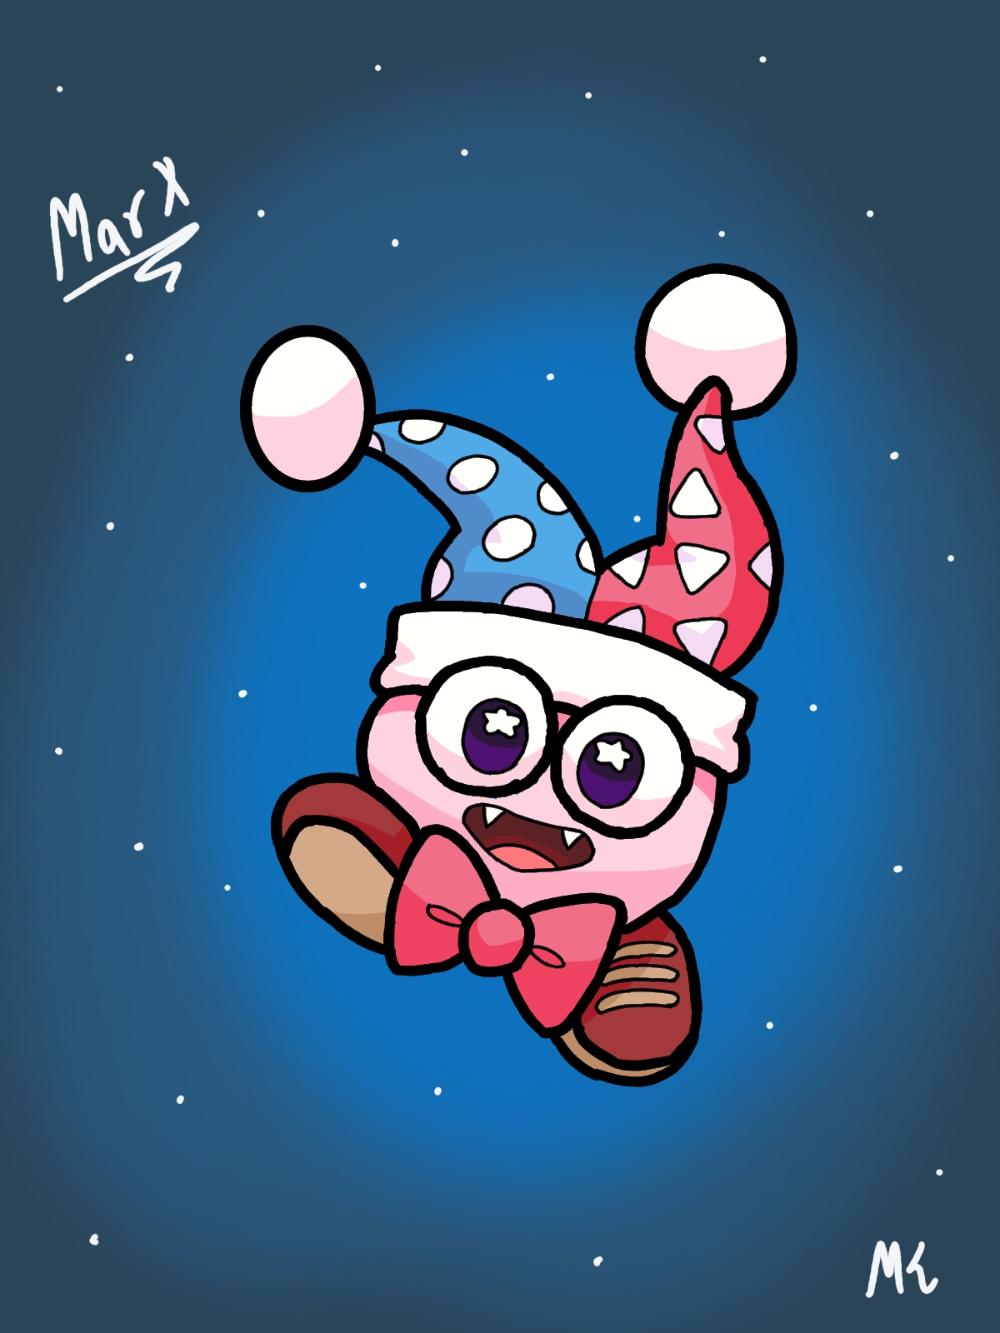 Marx Kirby By Maskedknightyt On Deviantart Kirby Kirby Art Cute Wallpaper For Phone